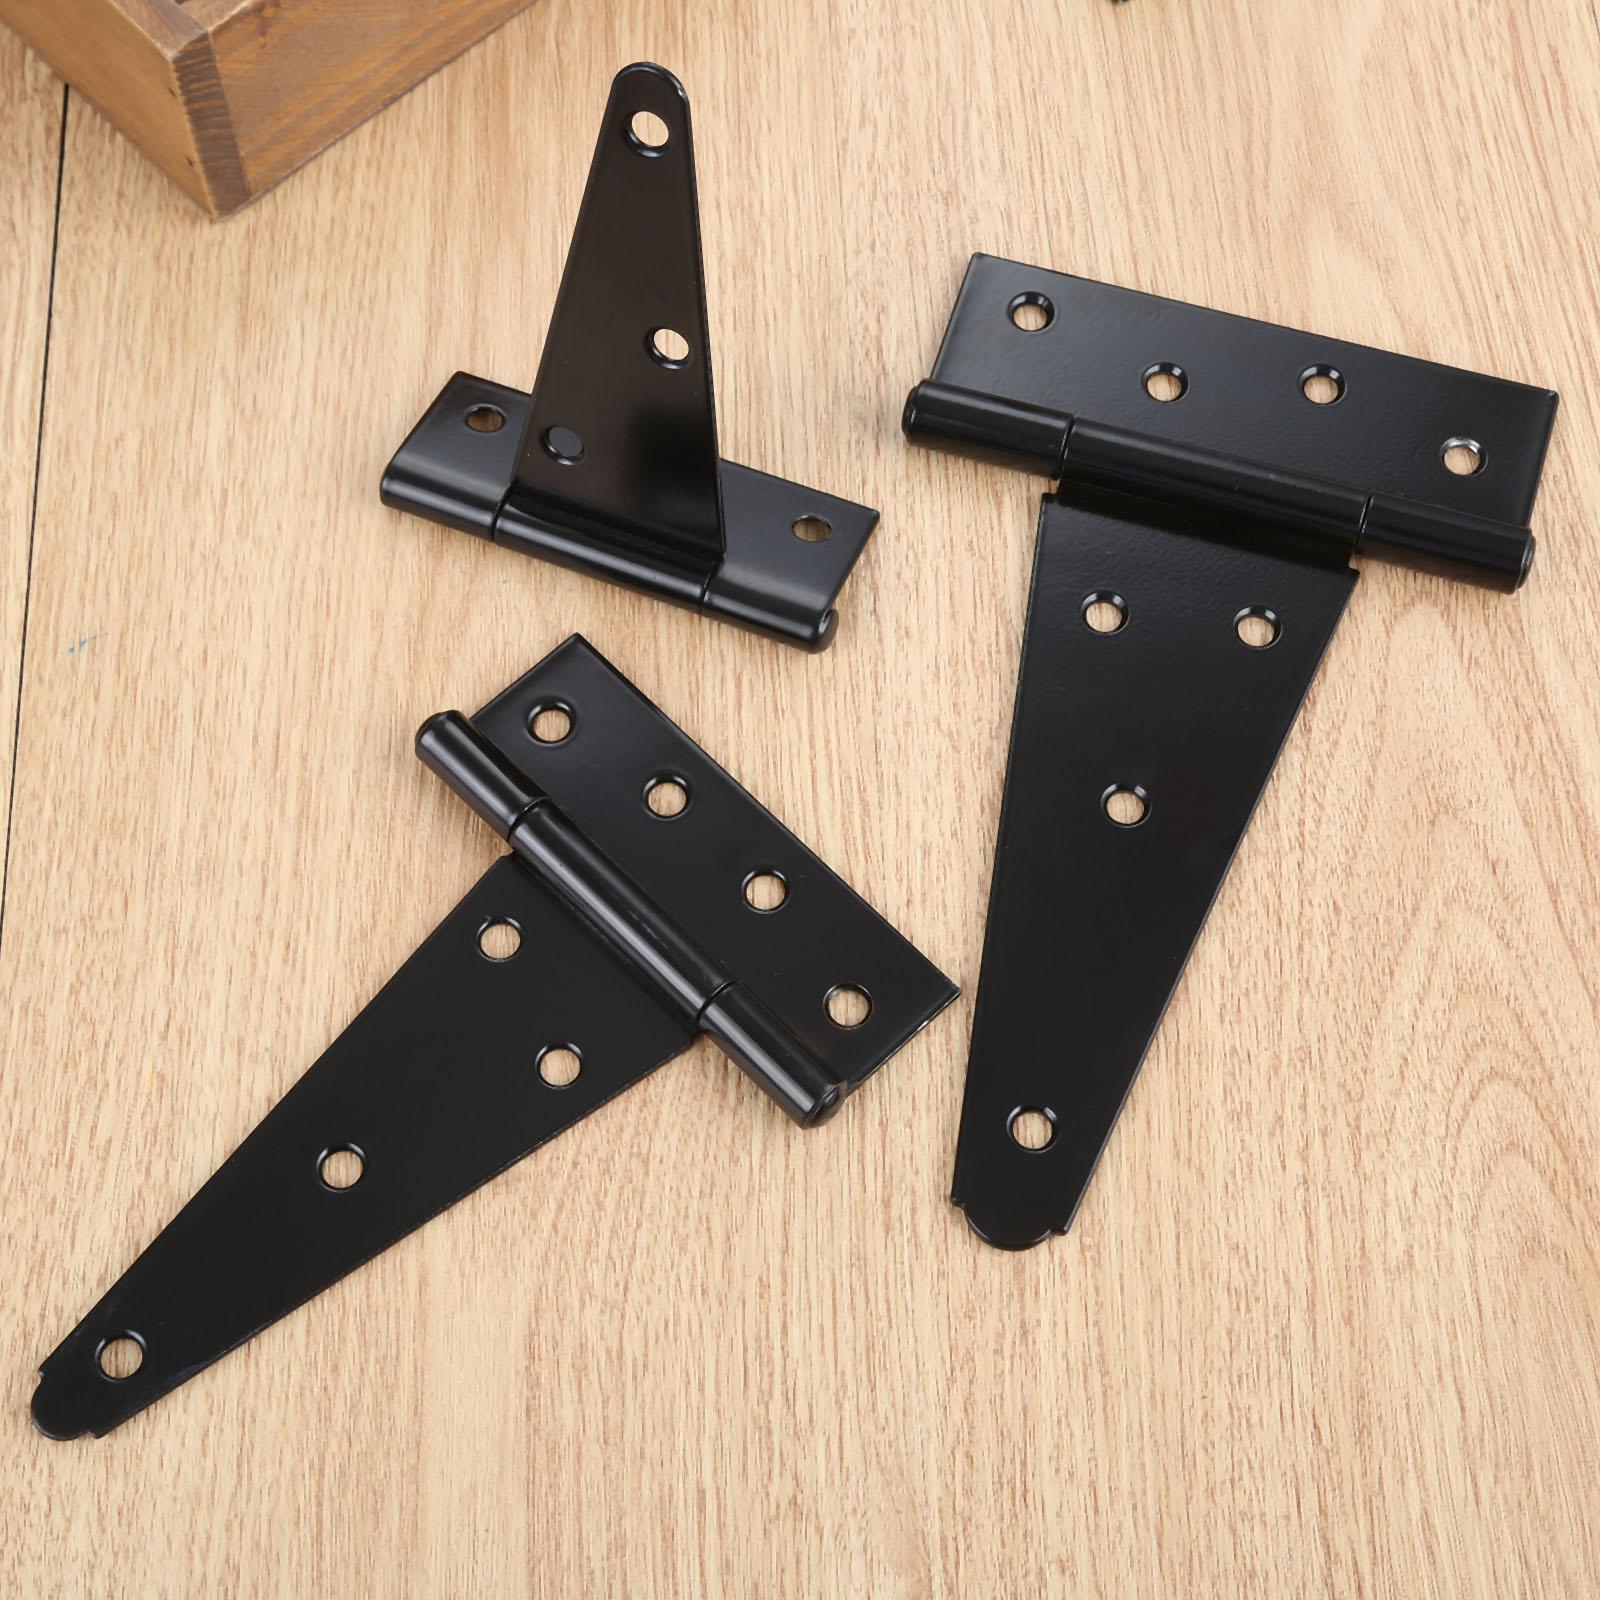 4/5/6inch Tee Hinge Wooden Box Case Industry Hinge Tool Box Wood Gate Door Heavy Thickening Hinge Furniture Hardware Pakistan